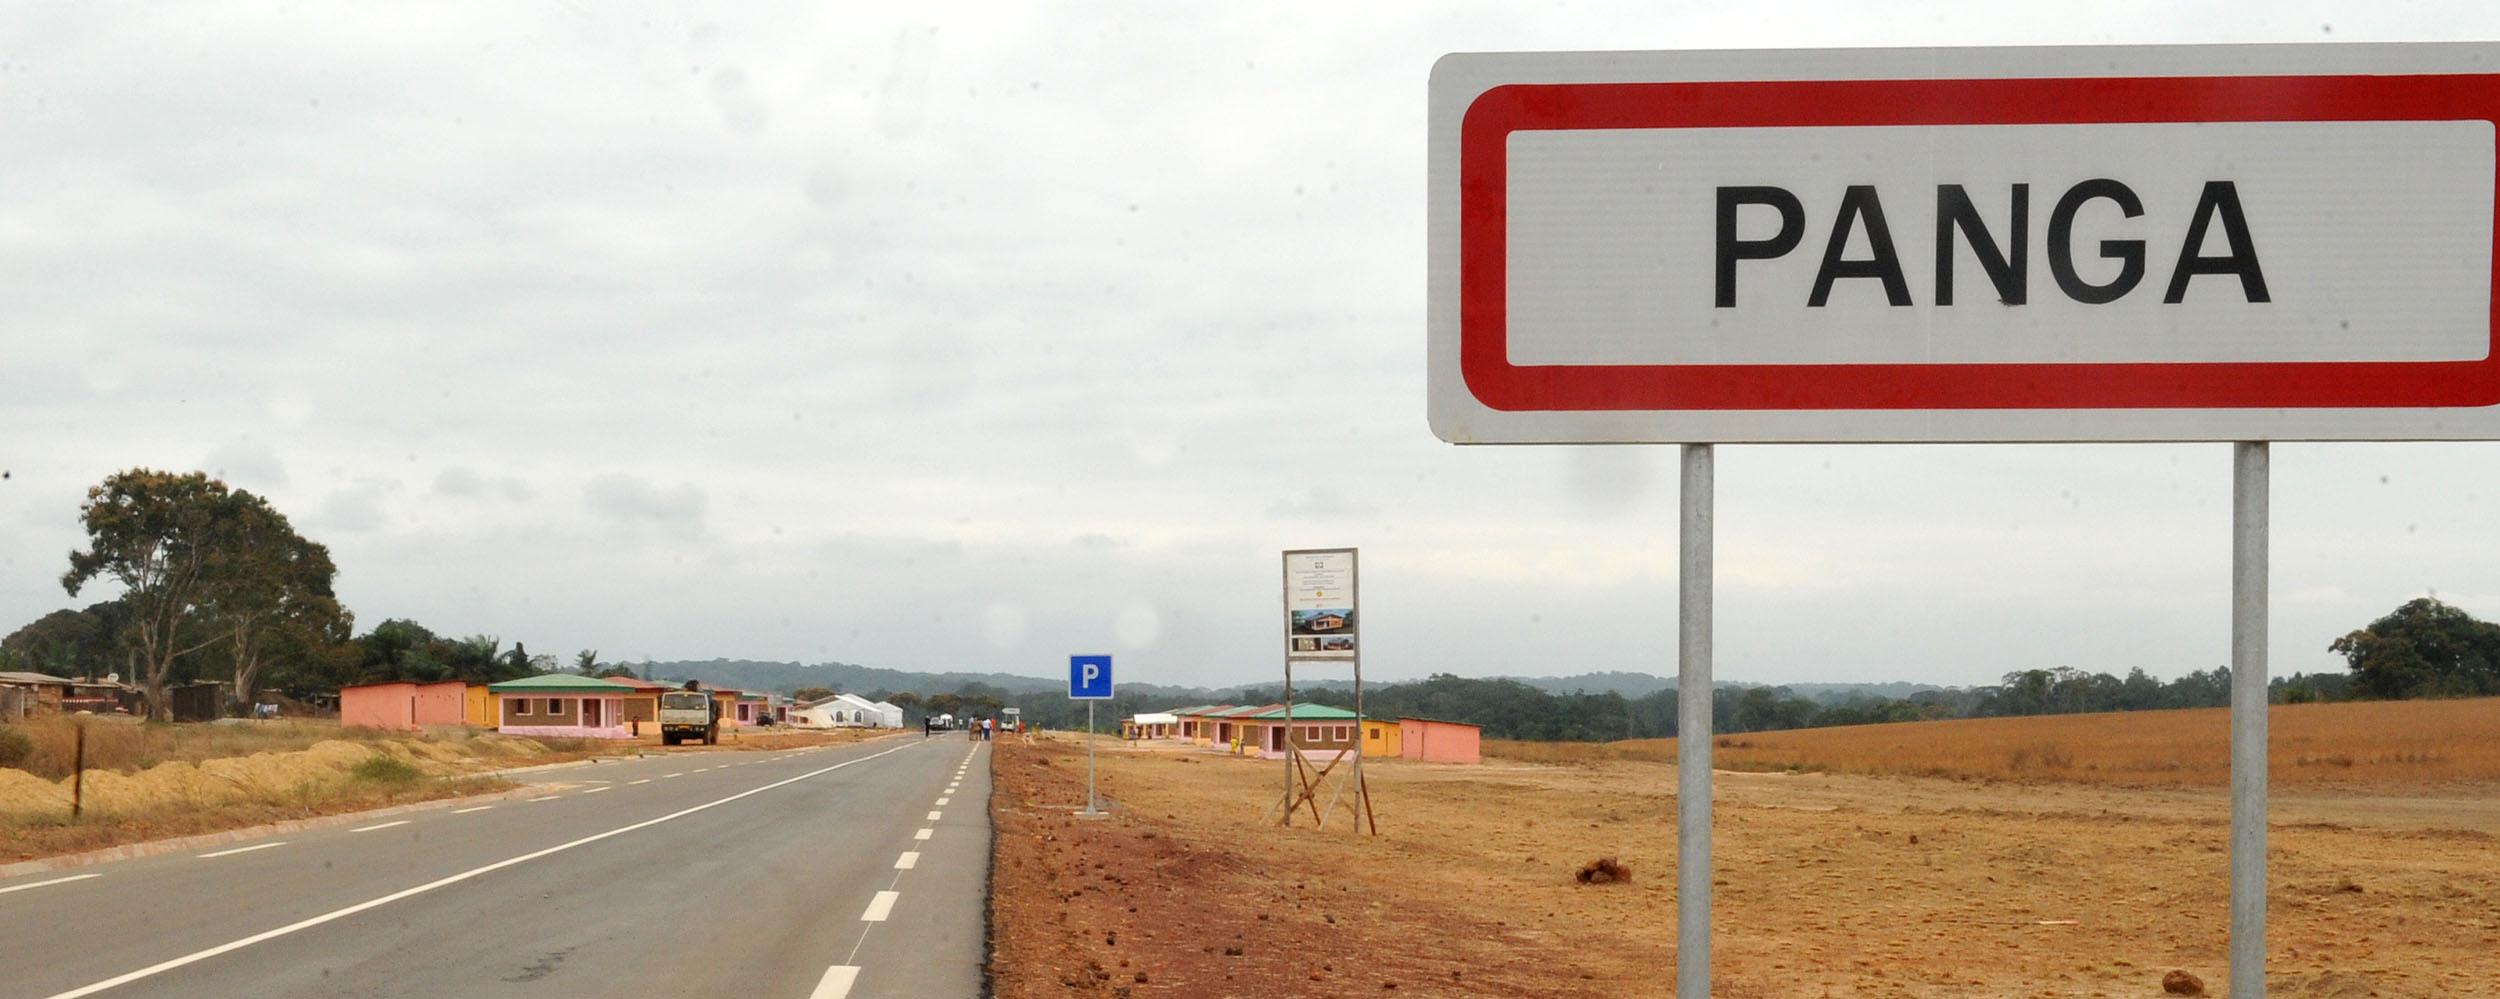 La route Loubomo-Mougagara, 53 km, inaugurée jeudi par Ali Bongo